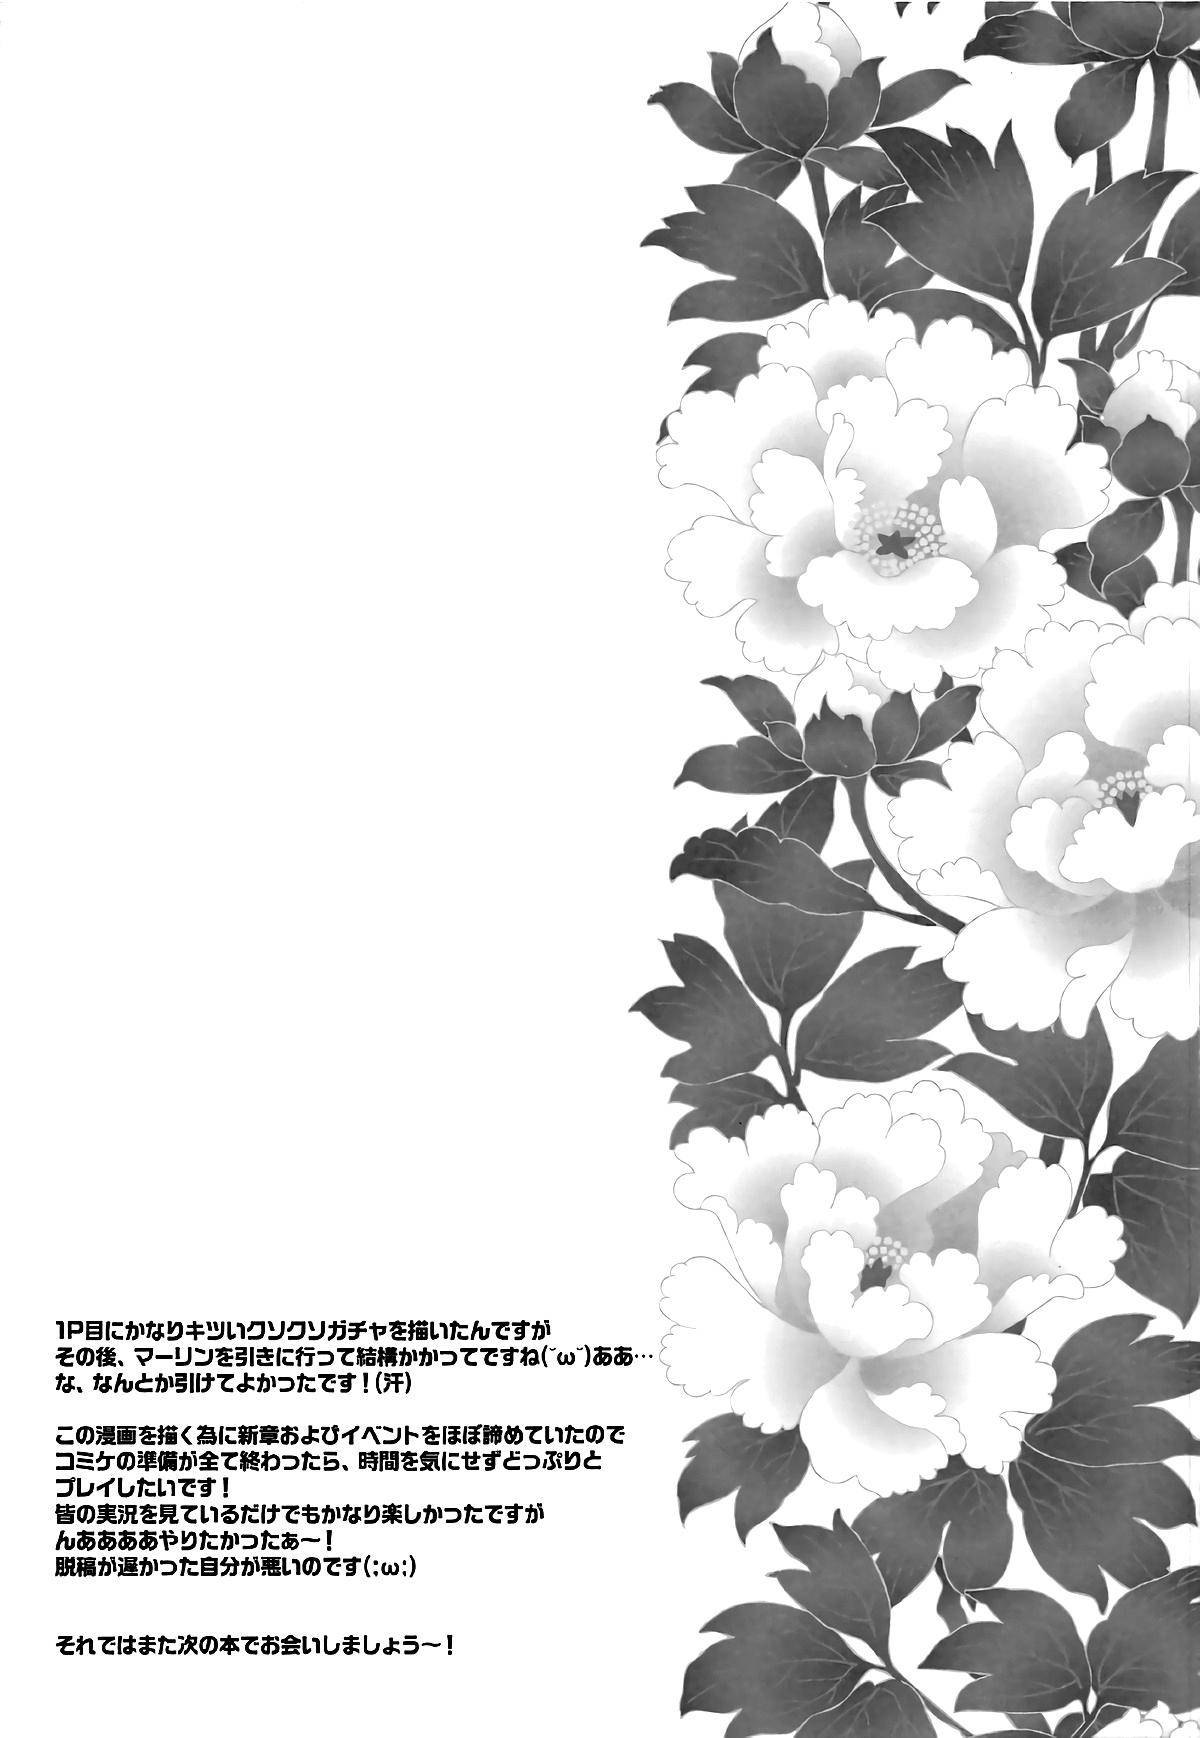 HentaiVN.net - Ảnh 22 - Chimimouryou Kikikaikai (Fate/Grand Order) [Việt Sub] - [うに蔵 (うに蔵)] 痴魅妄陵嬉々快界 (Fate/Grand Order) - Oneshot